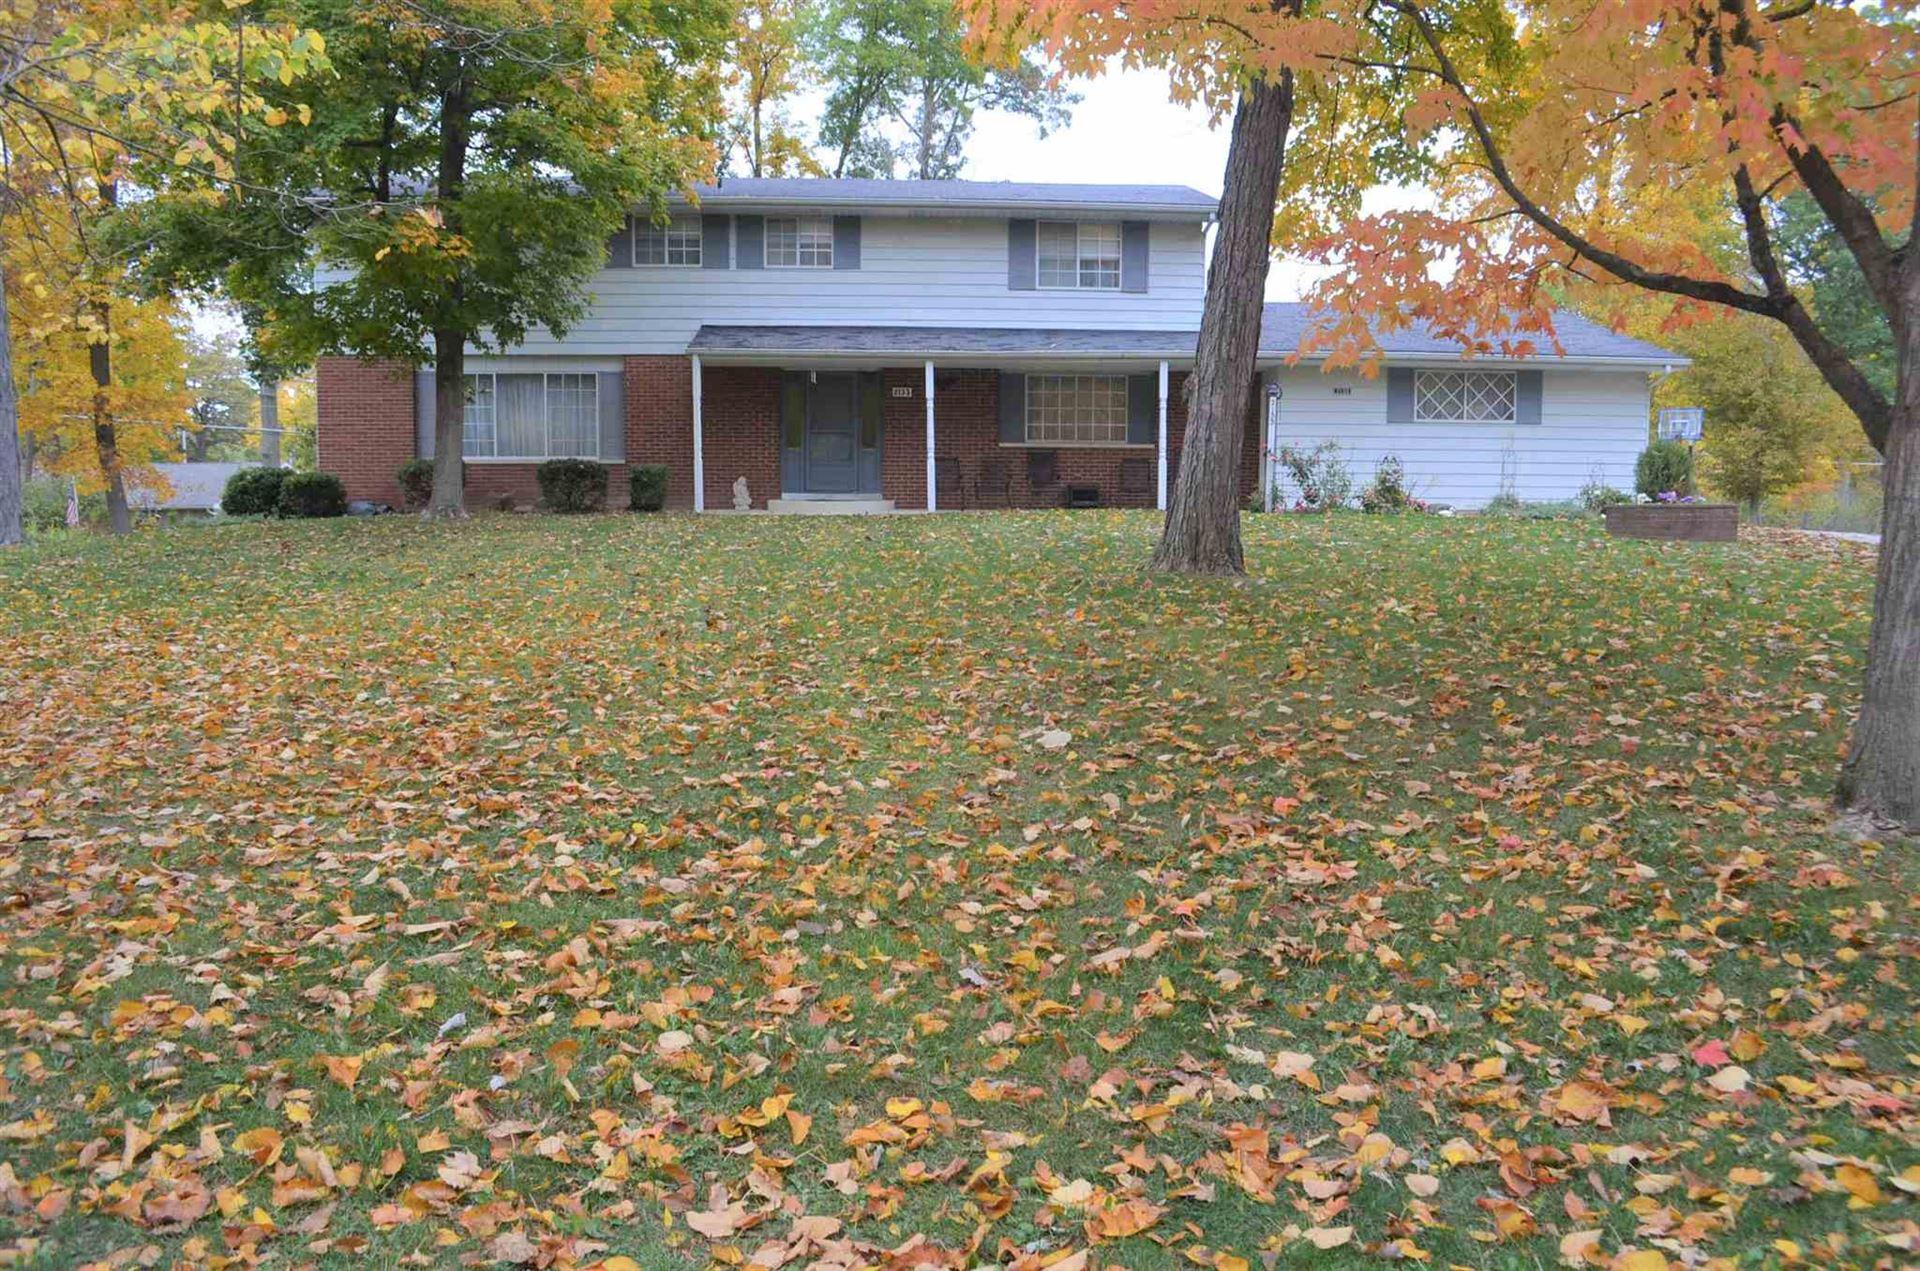 2133 Beechmont Drive, Fort Wayne, IN 46825 - #: 202043212